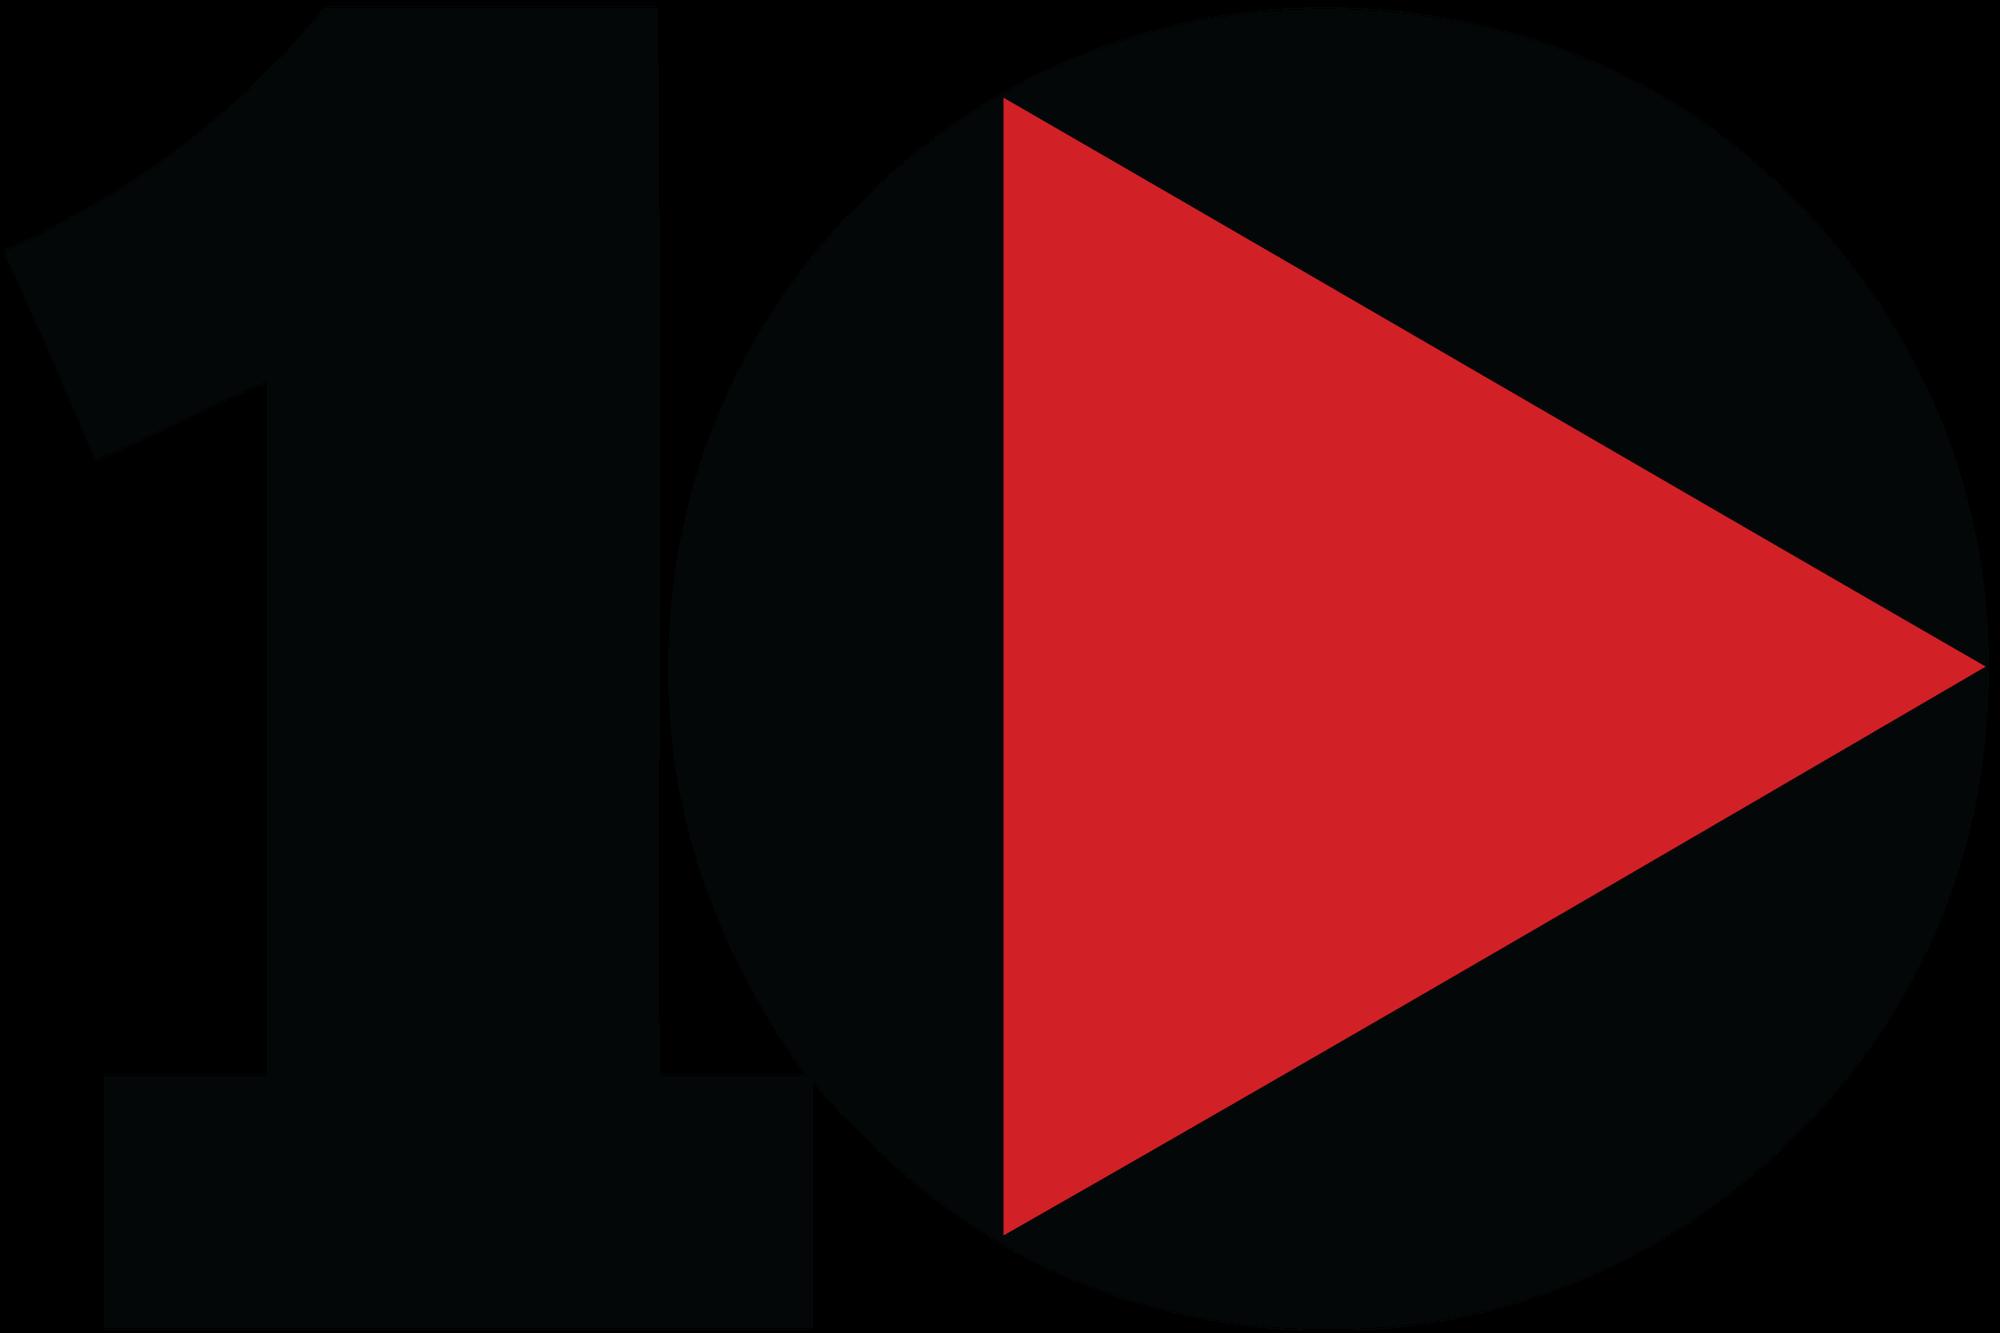 Promotional Videos - DGP2015 ComPark on Vimeo